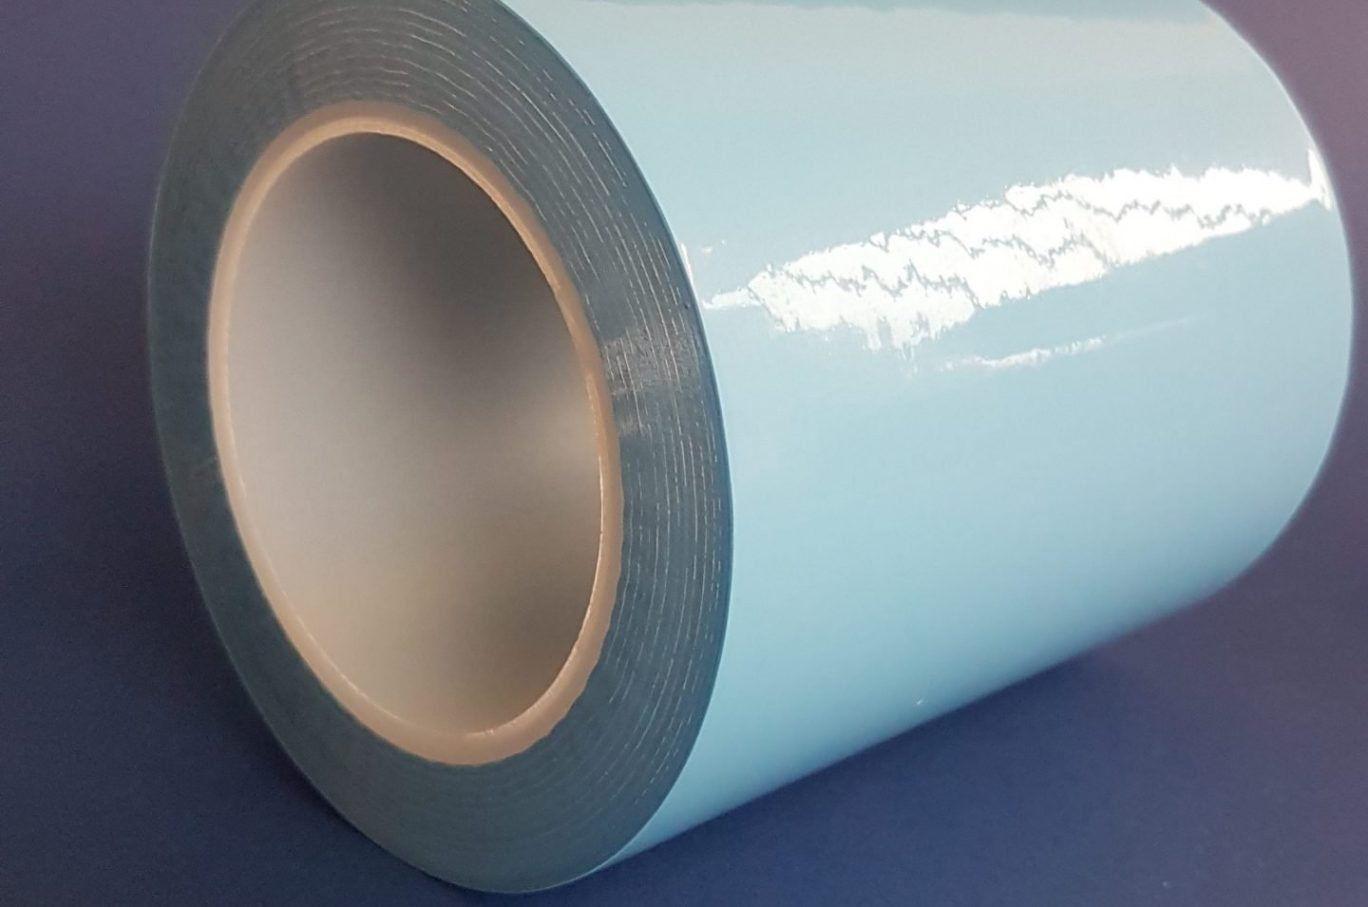 FEP adhesive tape